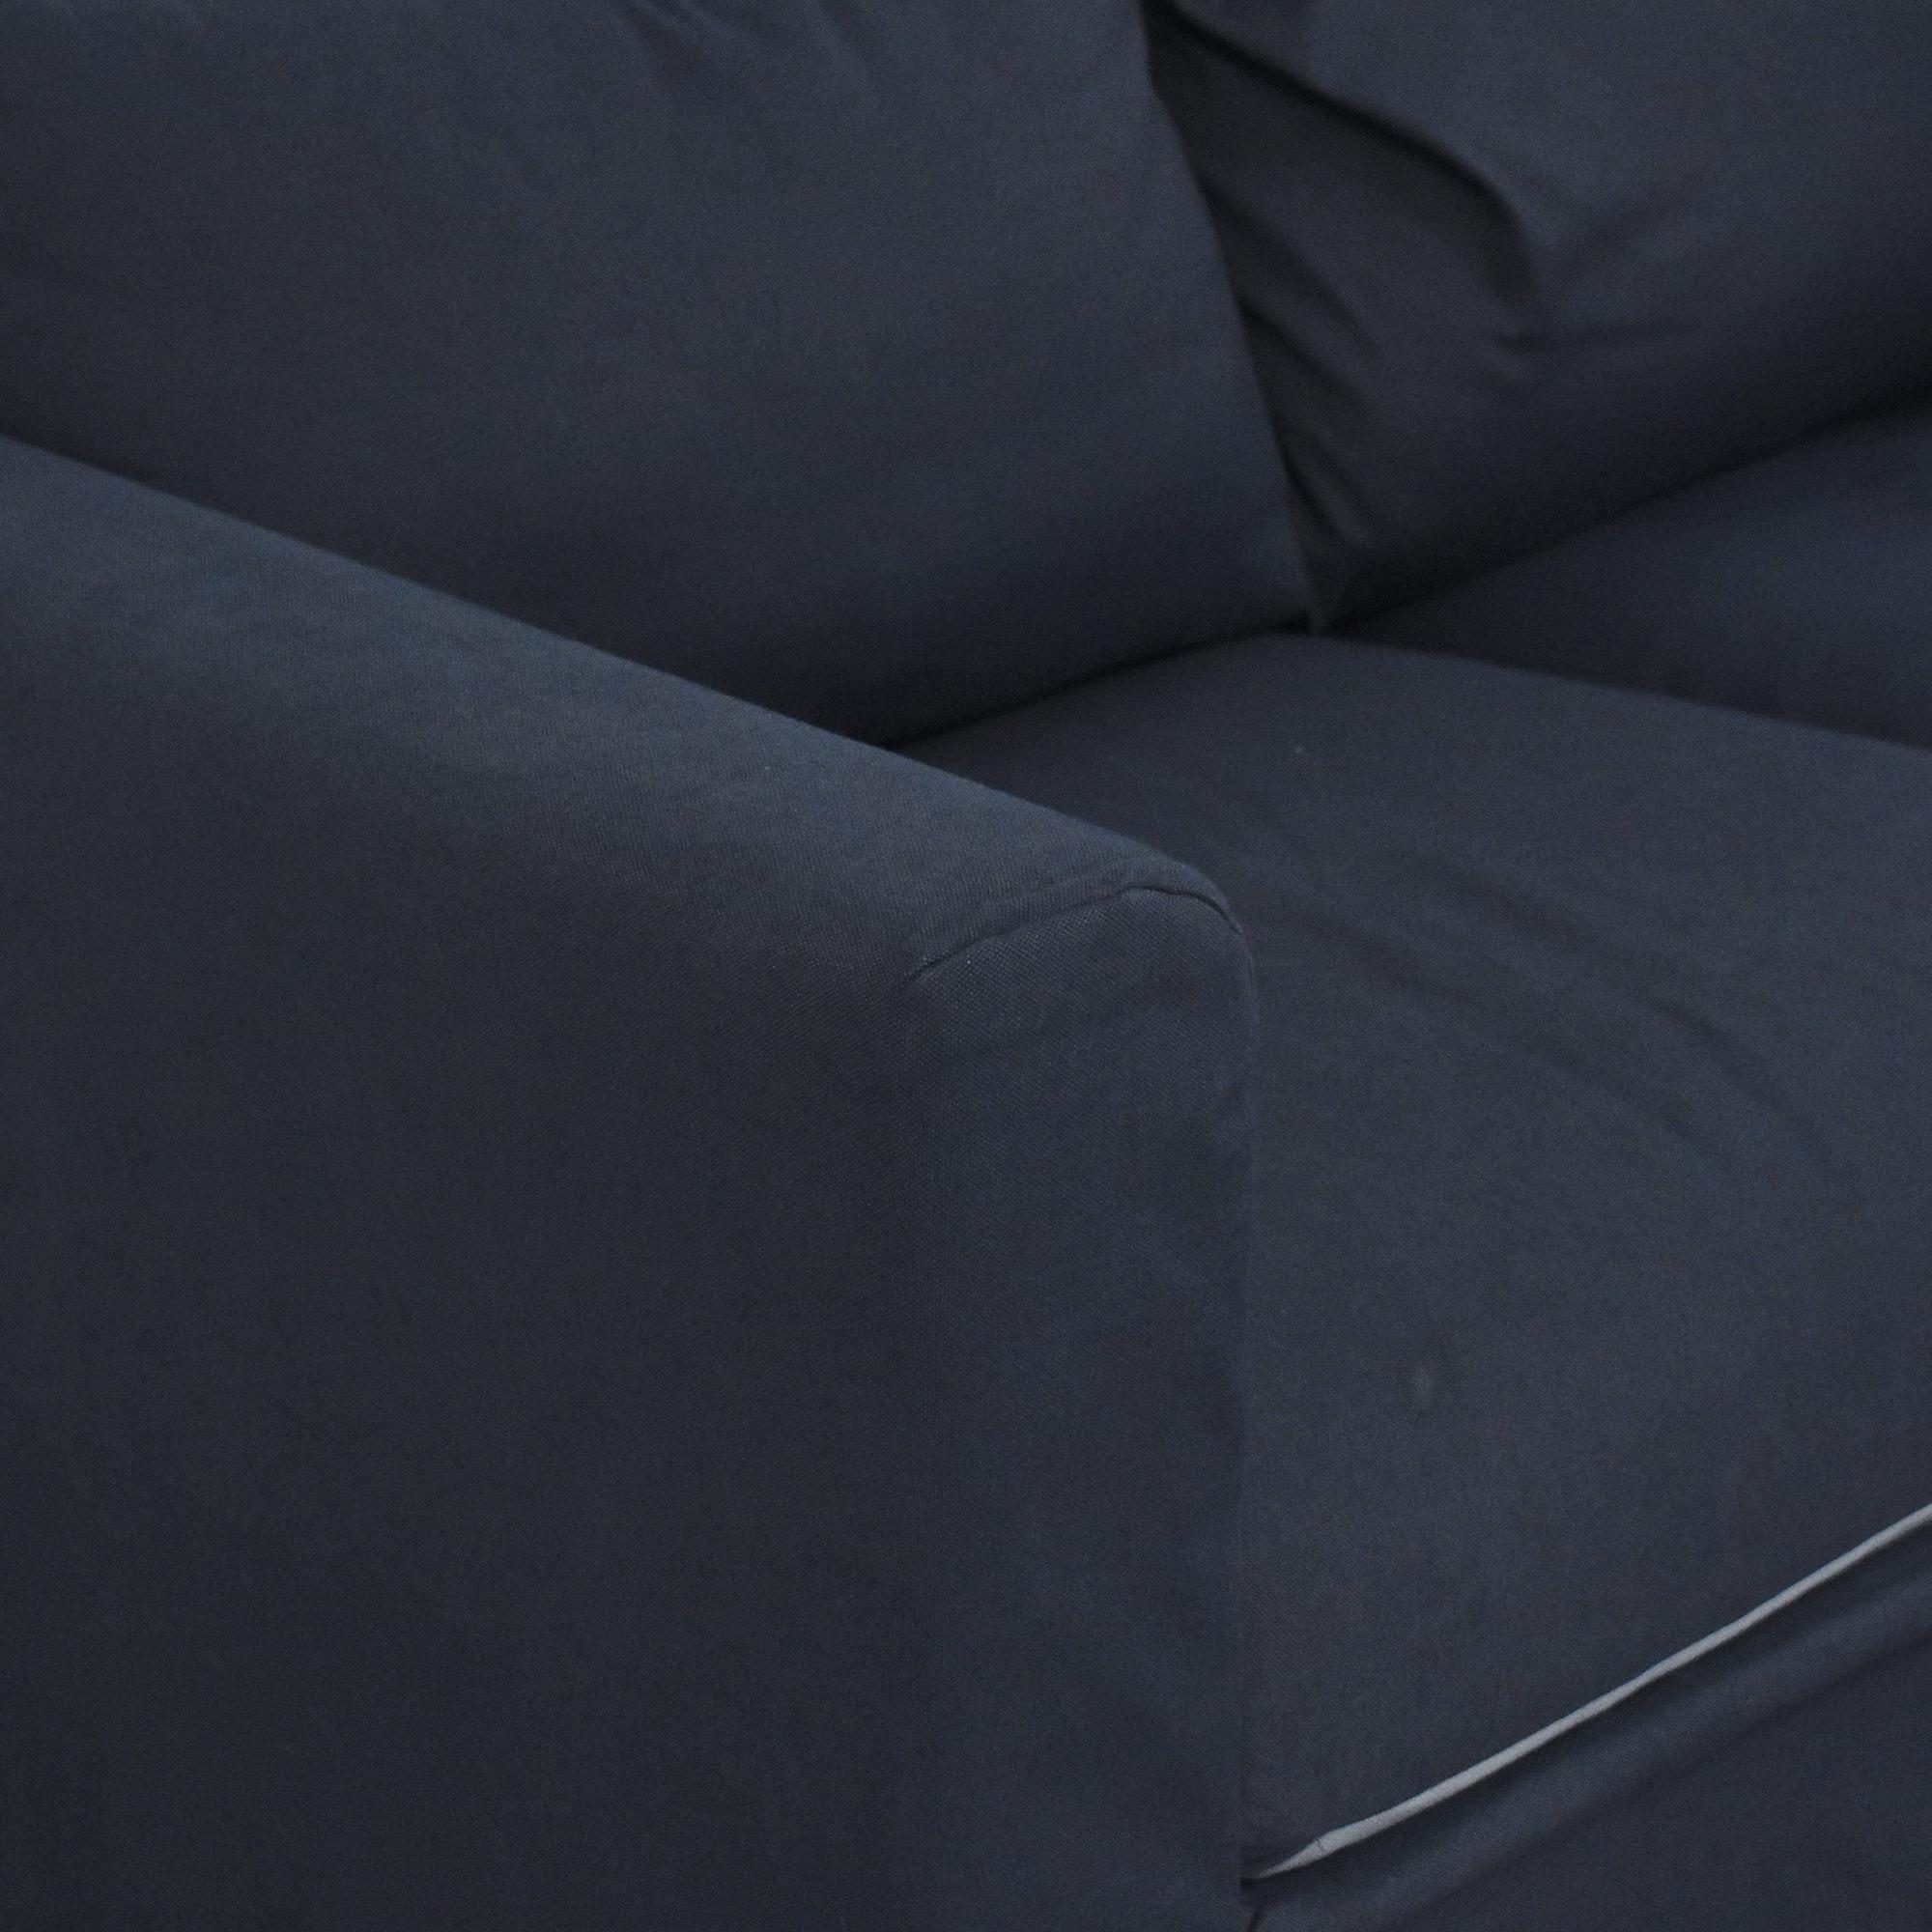 buy IKEA VIMLE Sectional Sofa IKEA Sofas